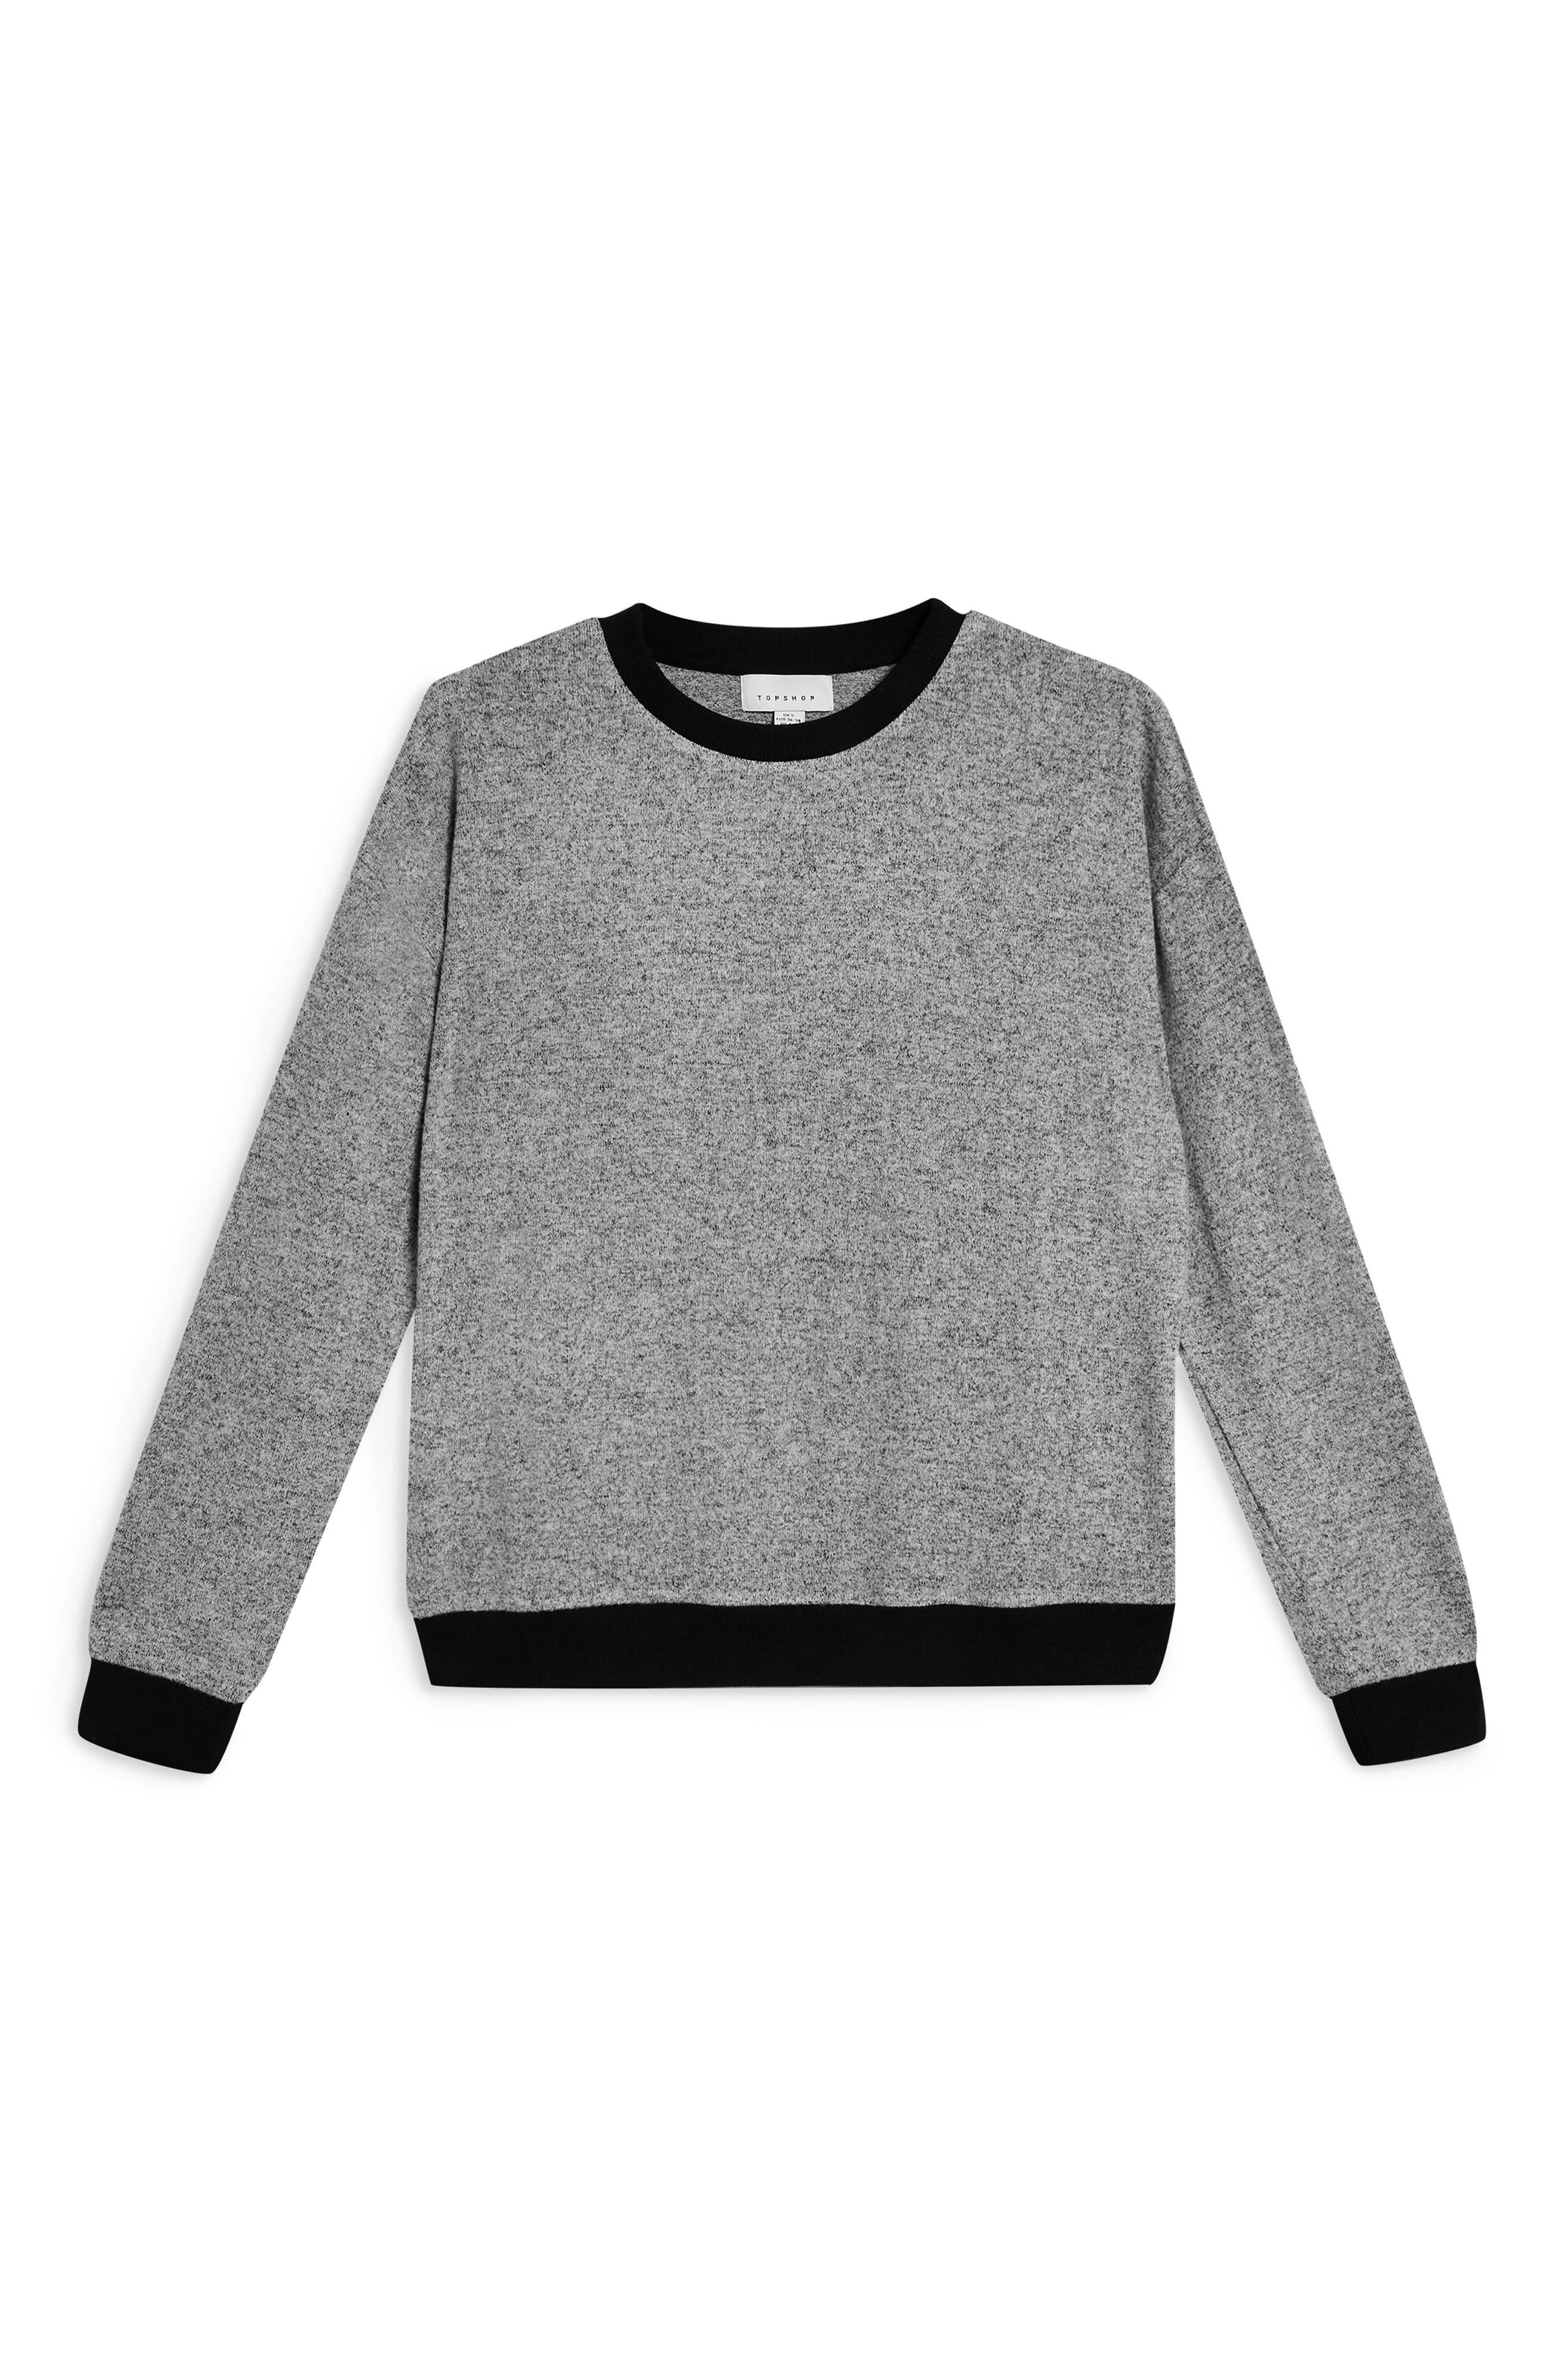 Supersoft Sweatshirt,                             Alternate thumbnail 2, color,                             GREY MARL